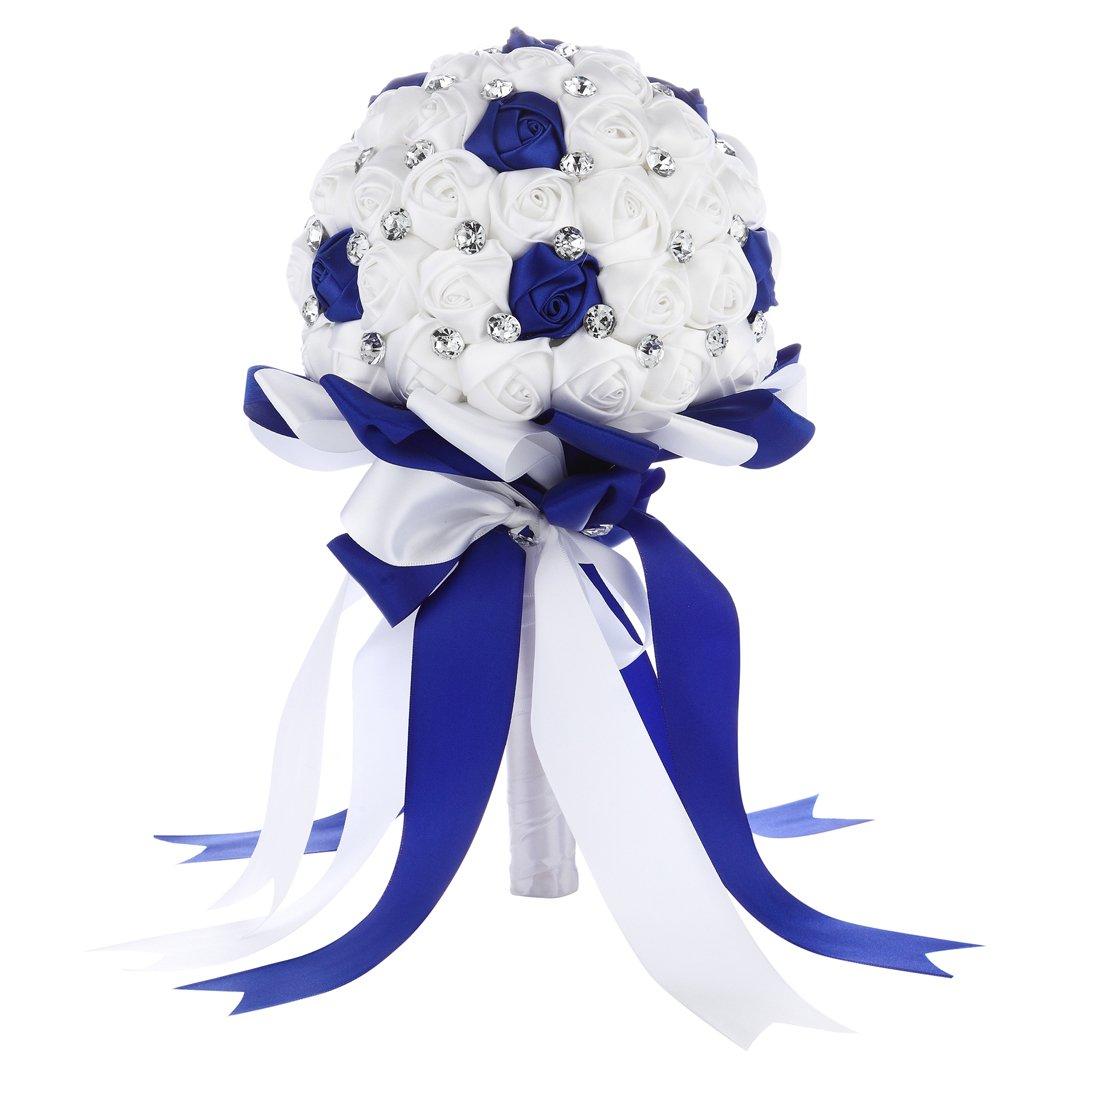 Blue bouquet for wedding amazon faybox crystal satin rose bridal bridesmaid bouquets wedding flower decor royal blue 2 izmirmasajfo